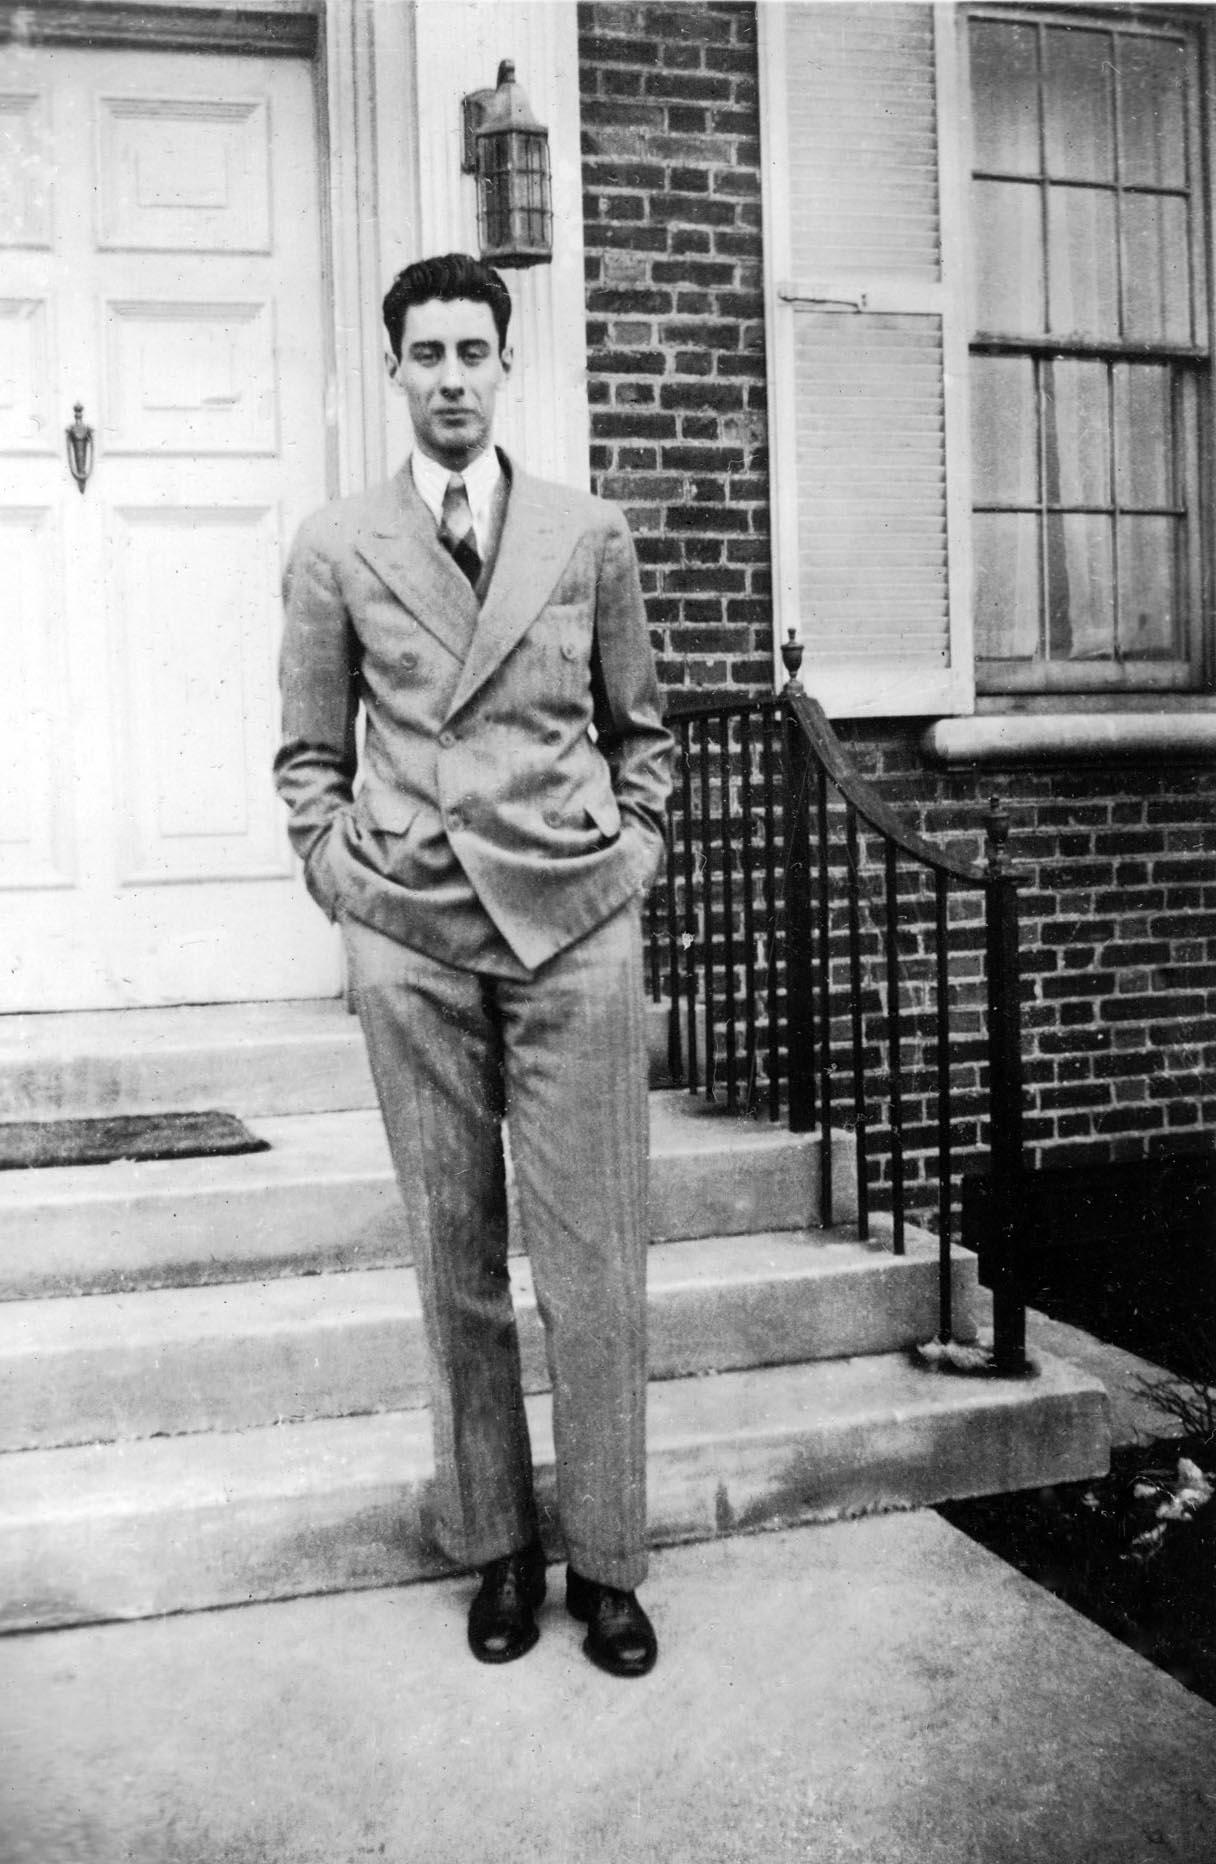 Richard H. Knowles 1938 - Philadelphia, PA